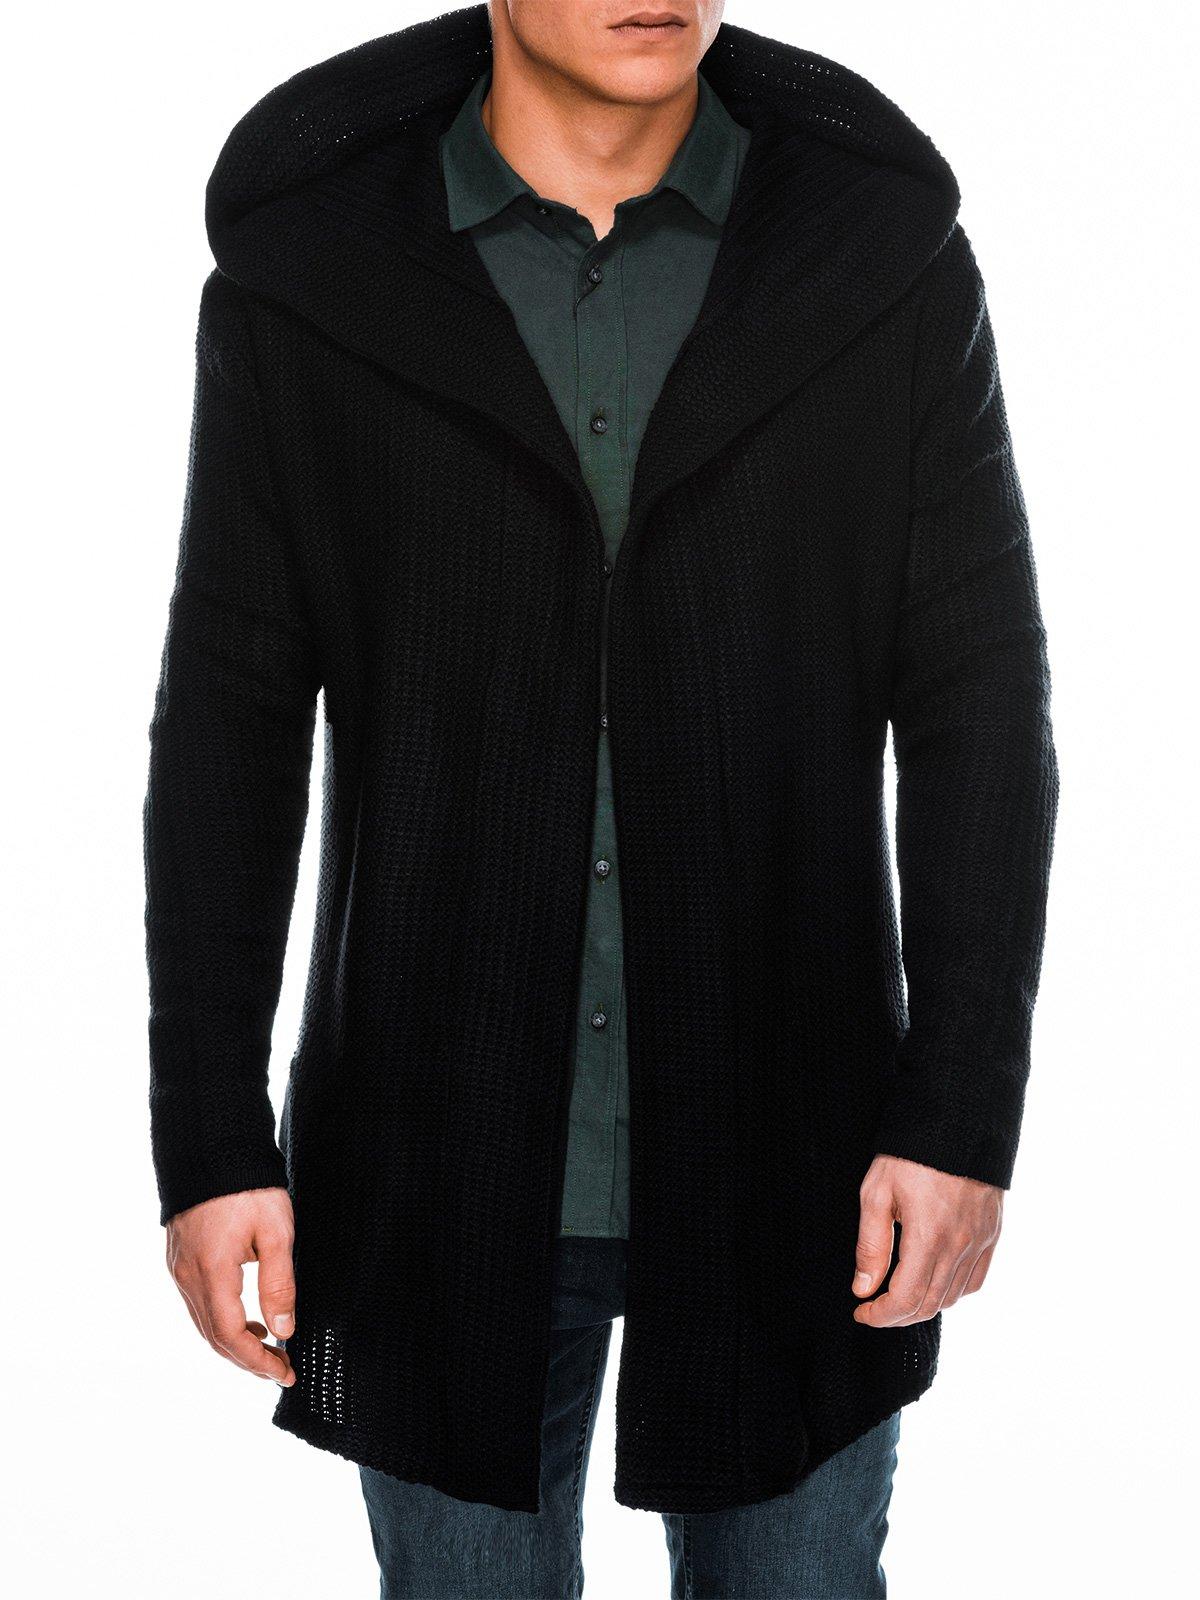 Pánsky sveter Biggie čierna XXL